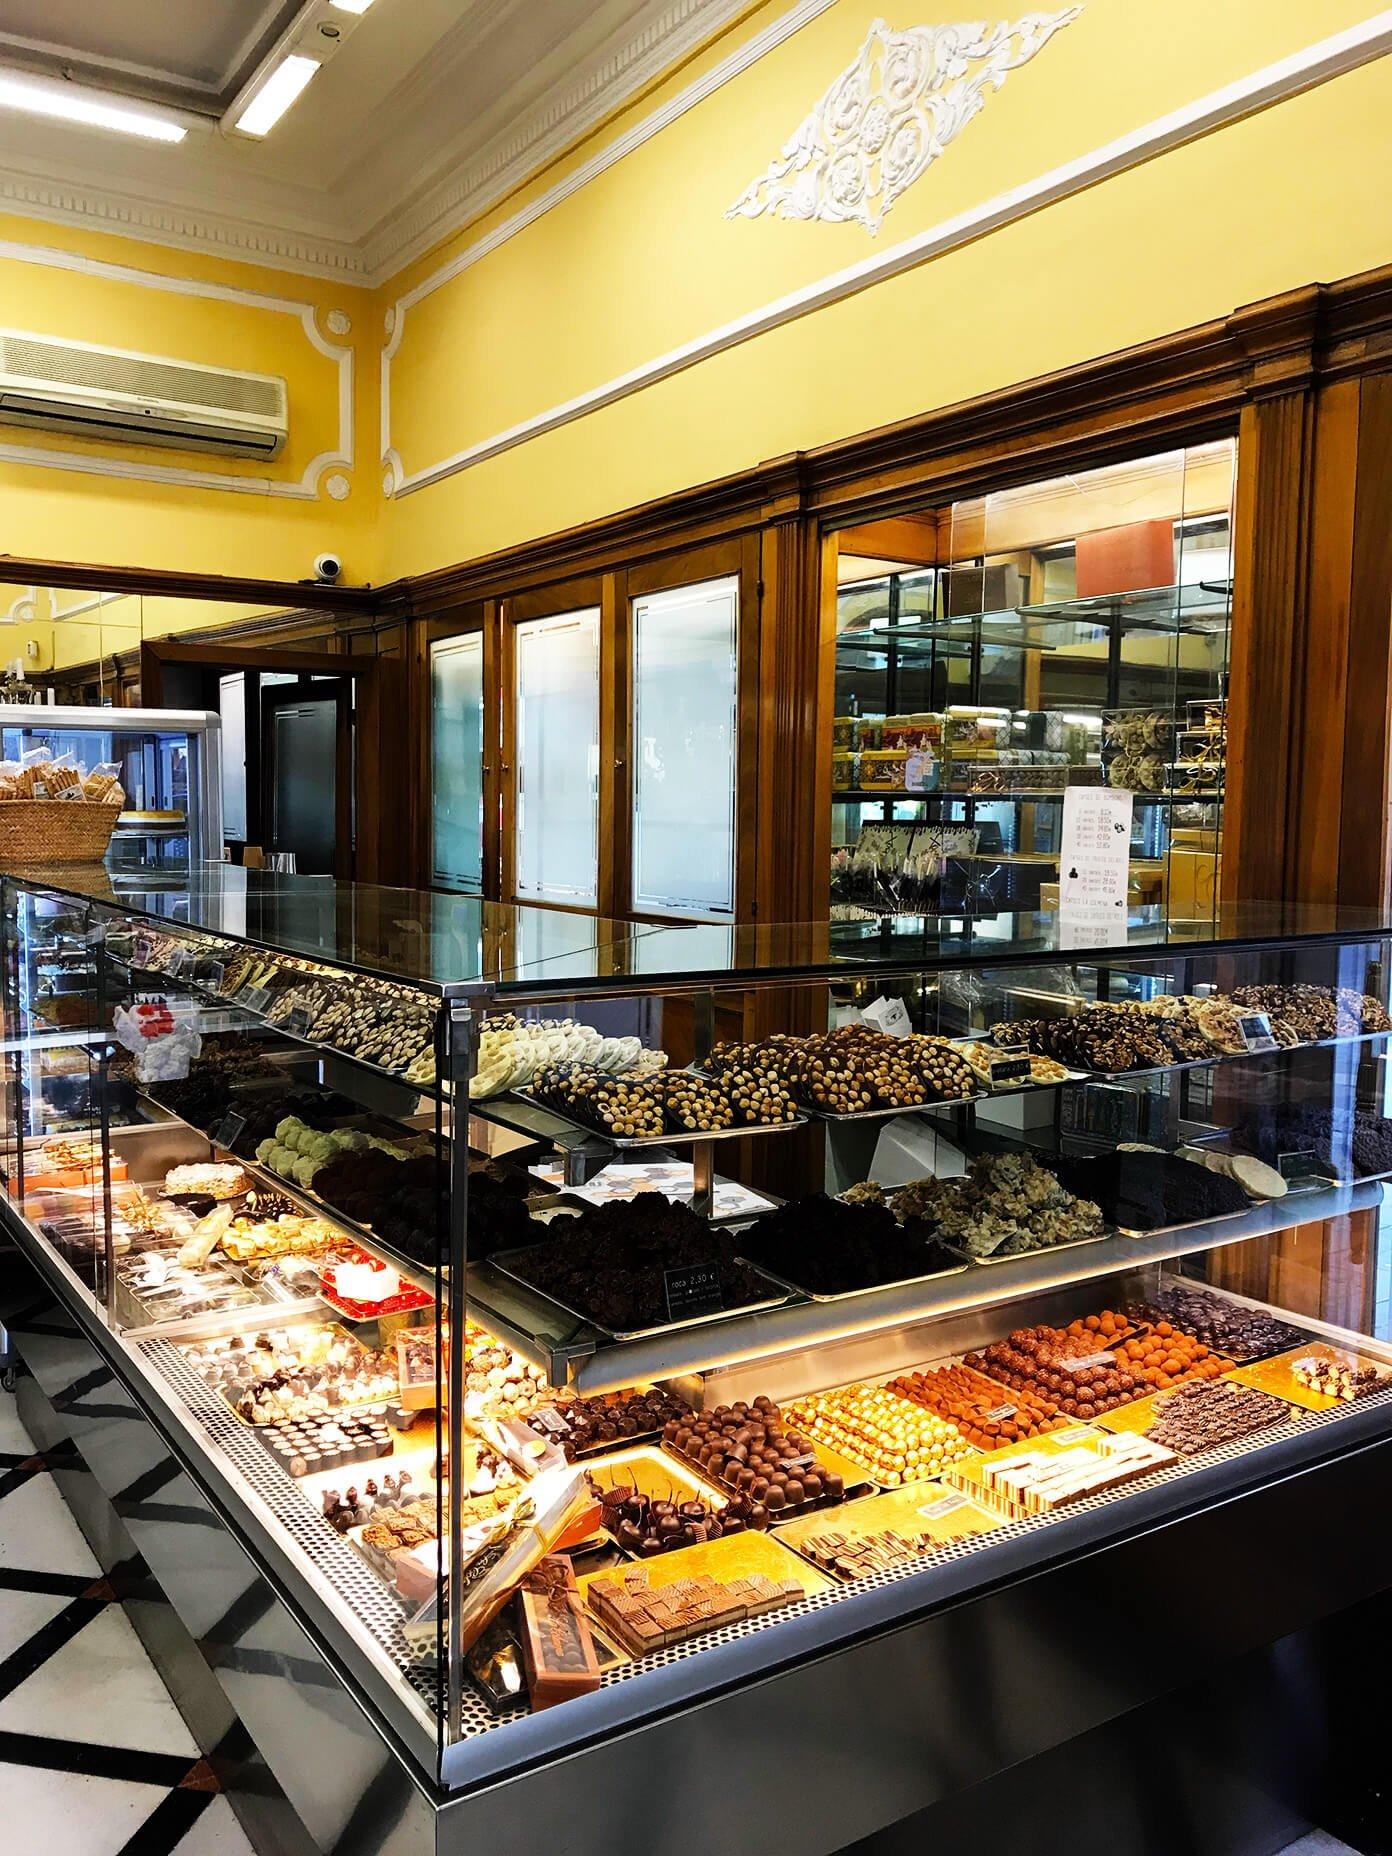 La Colmena - classic sweet shop | Gimme Some Barcelona Travel Guide